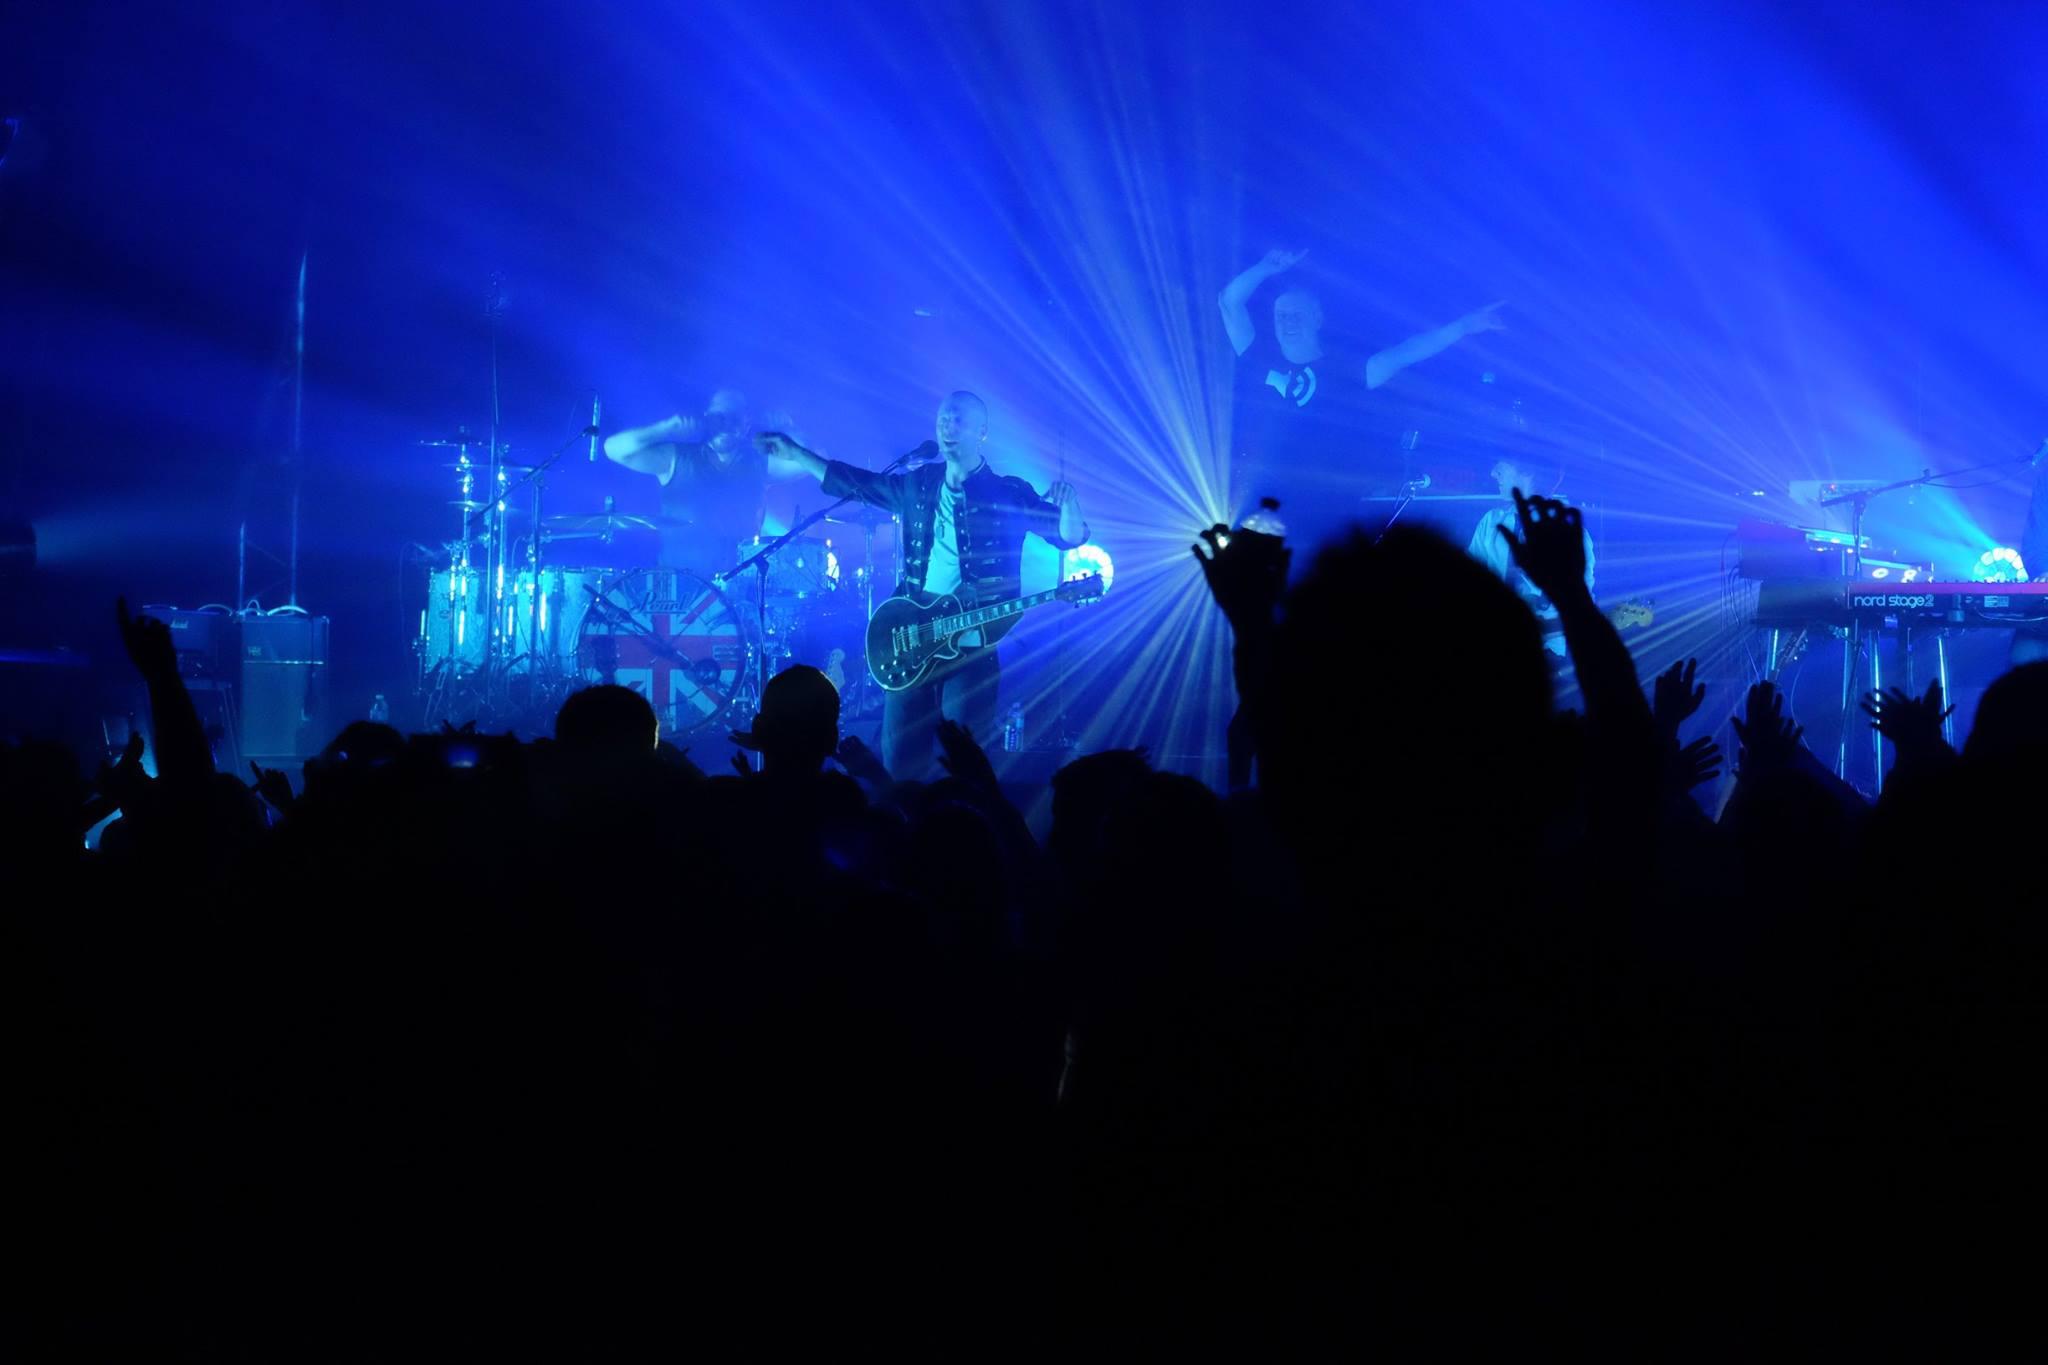 Concert du Groupe UK on the Rocks au Puy du Fou